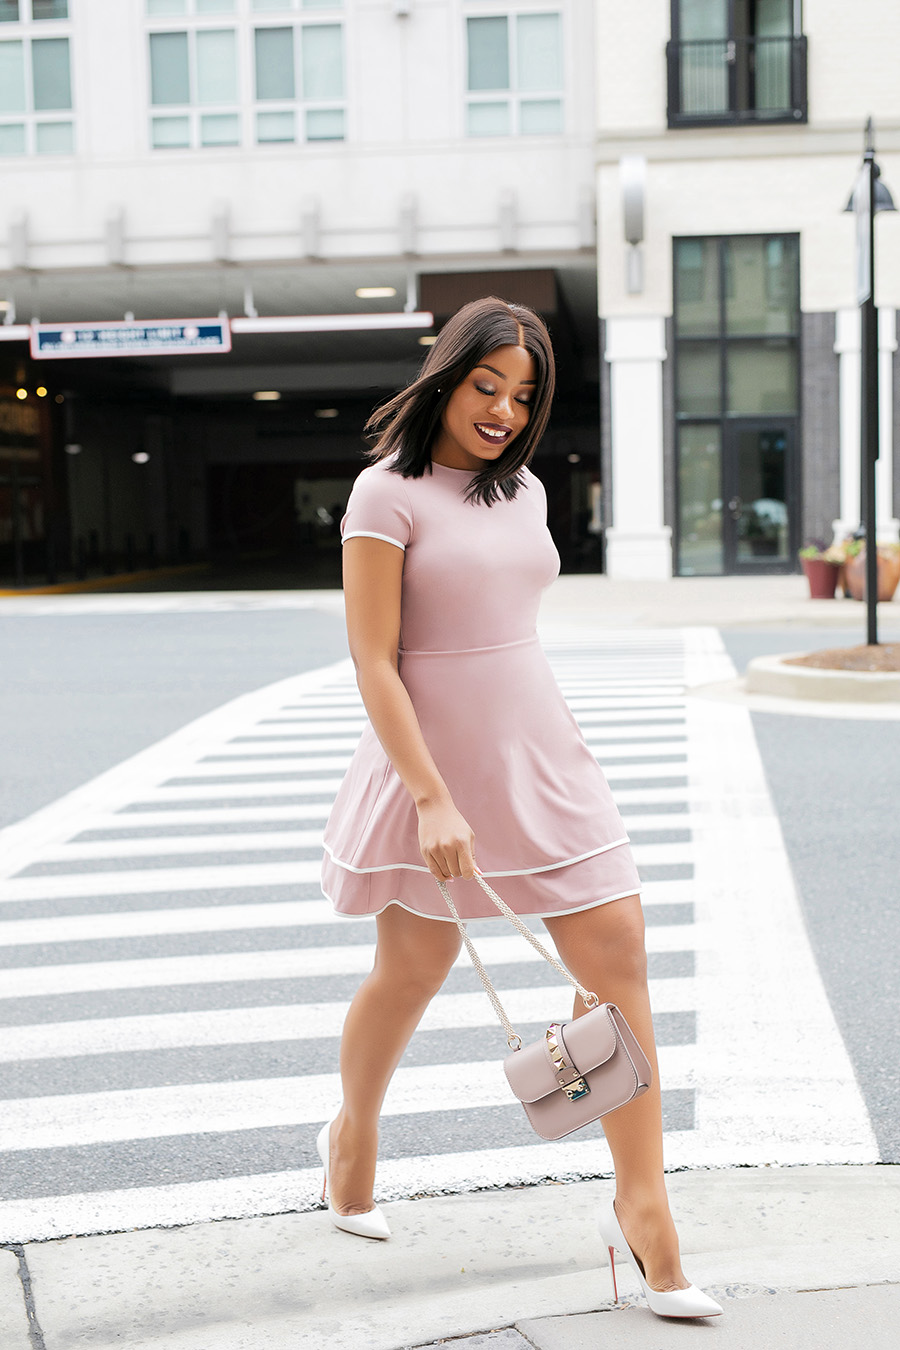 Stella-adewunmi-of-jadore-fashion-shares-spring-dress-easter-weekend